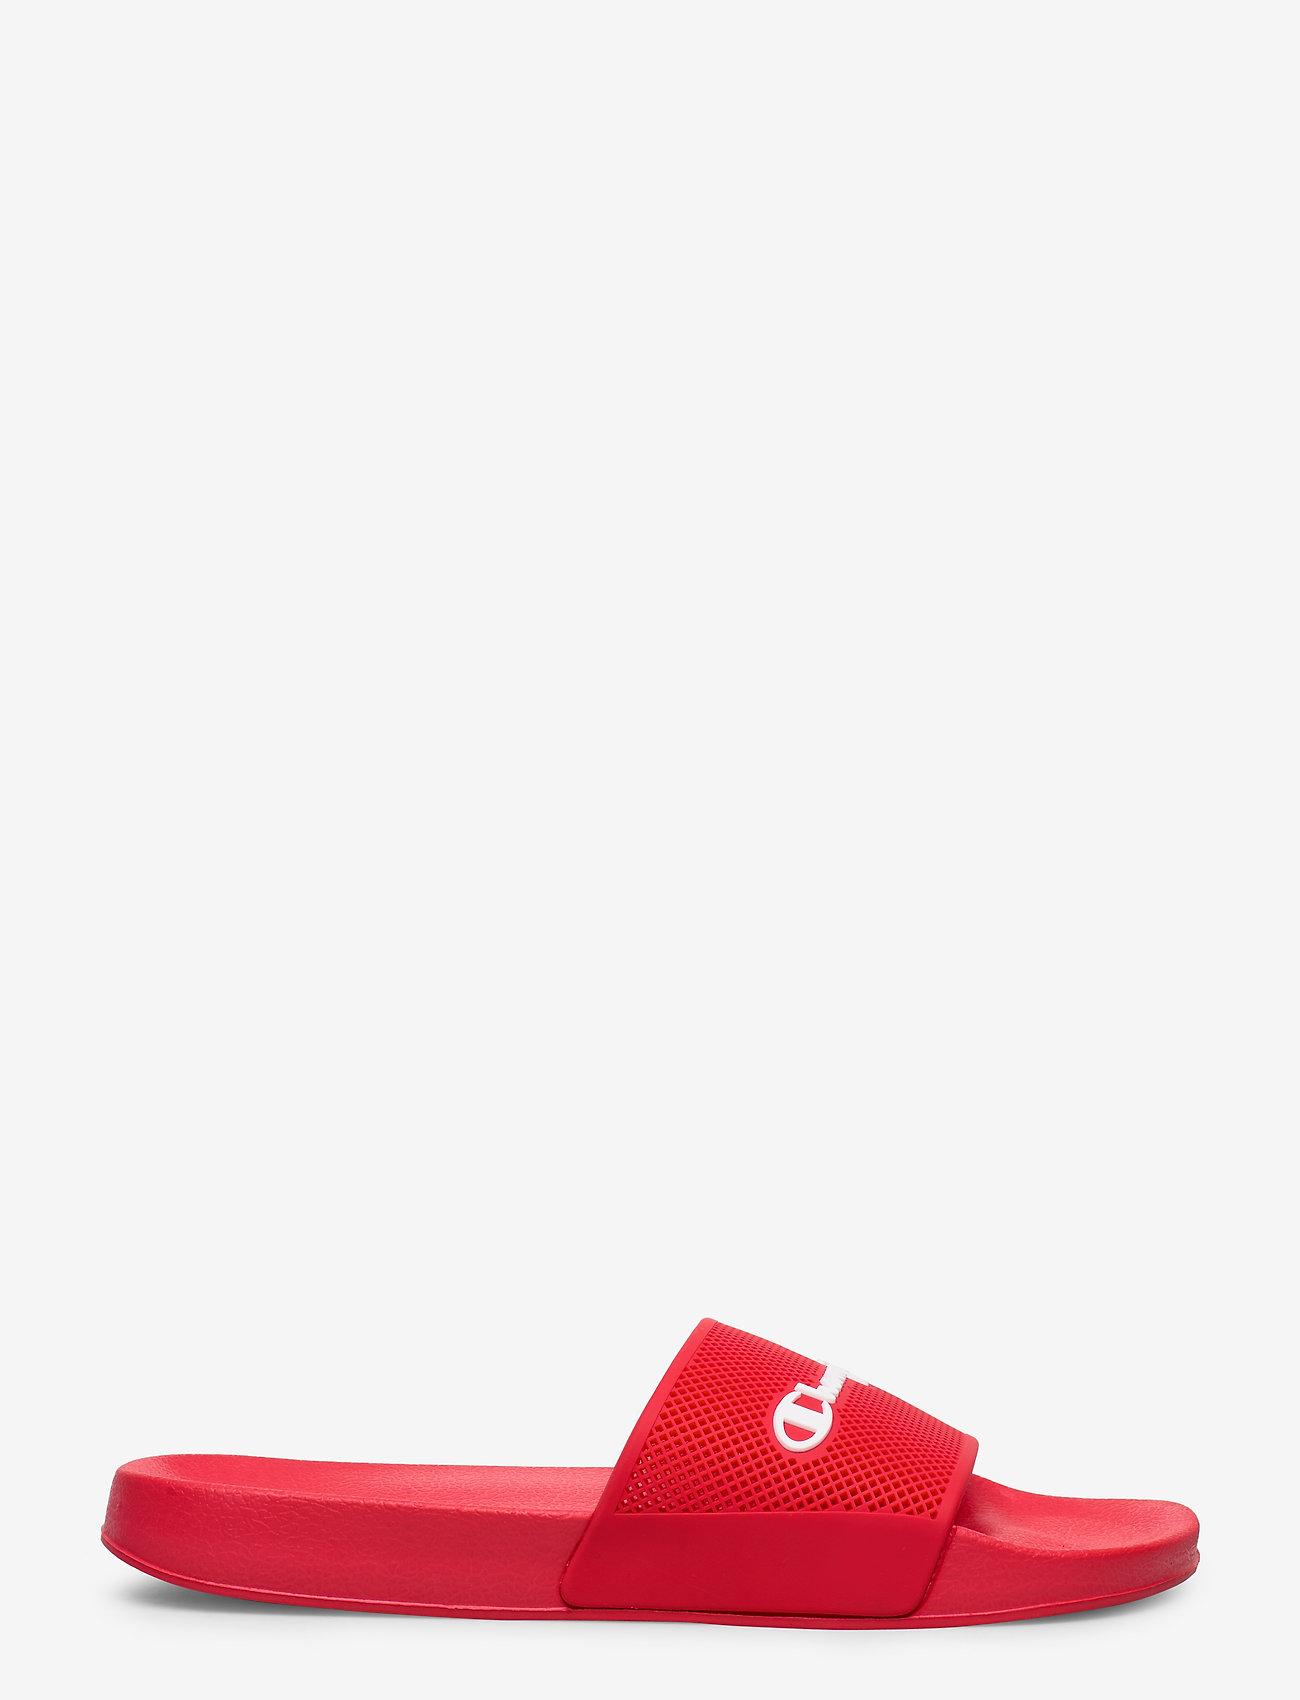 Champion - Sandal DAYTONA - pool sliders - ribbon red - 1